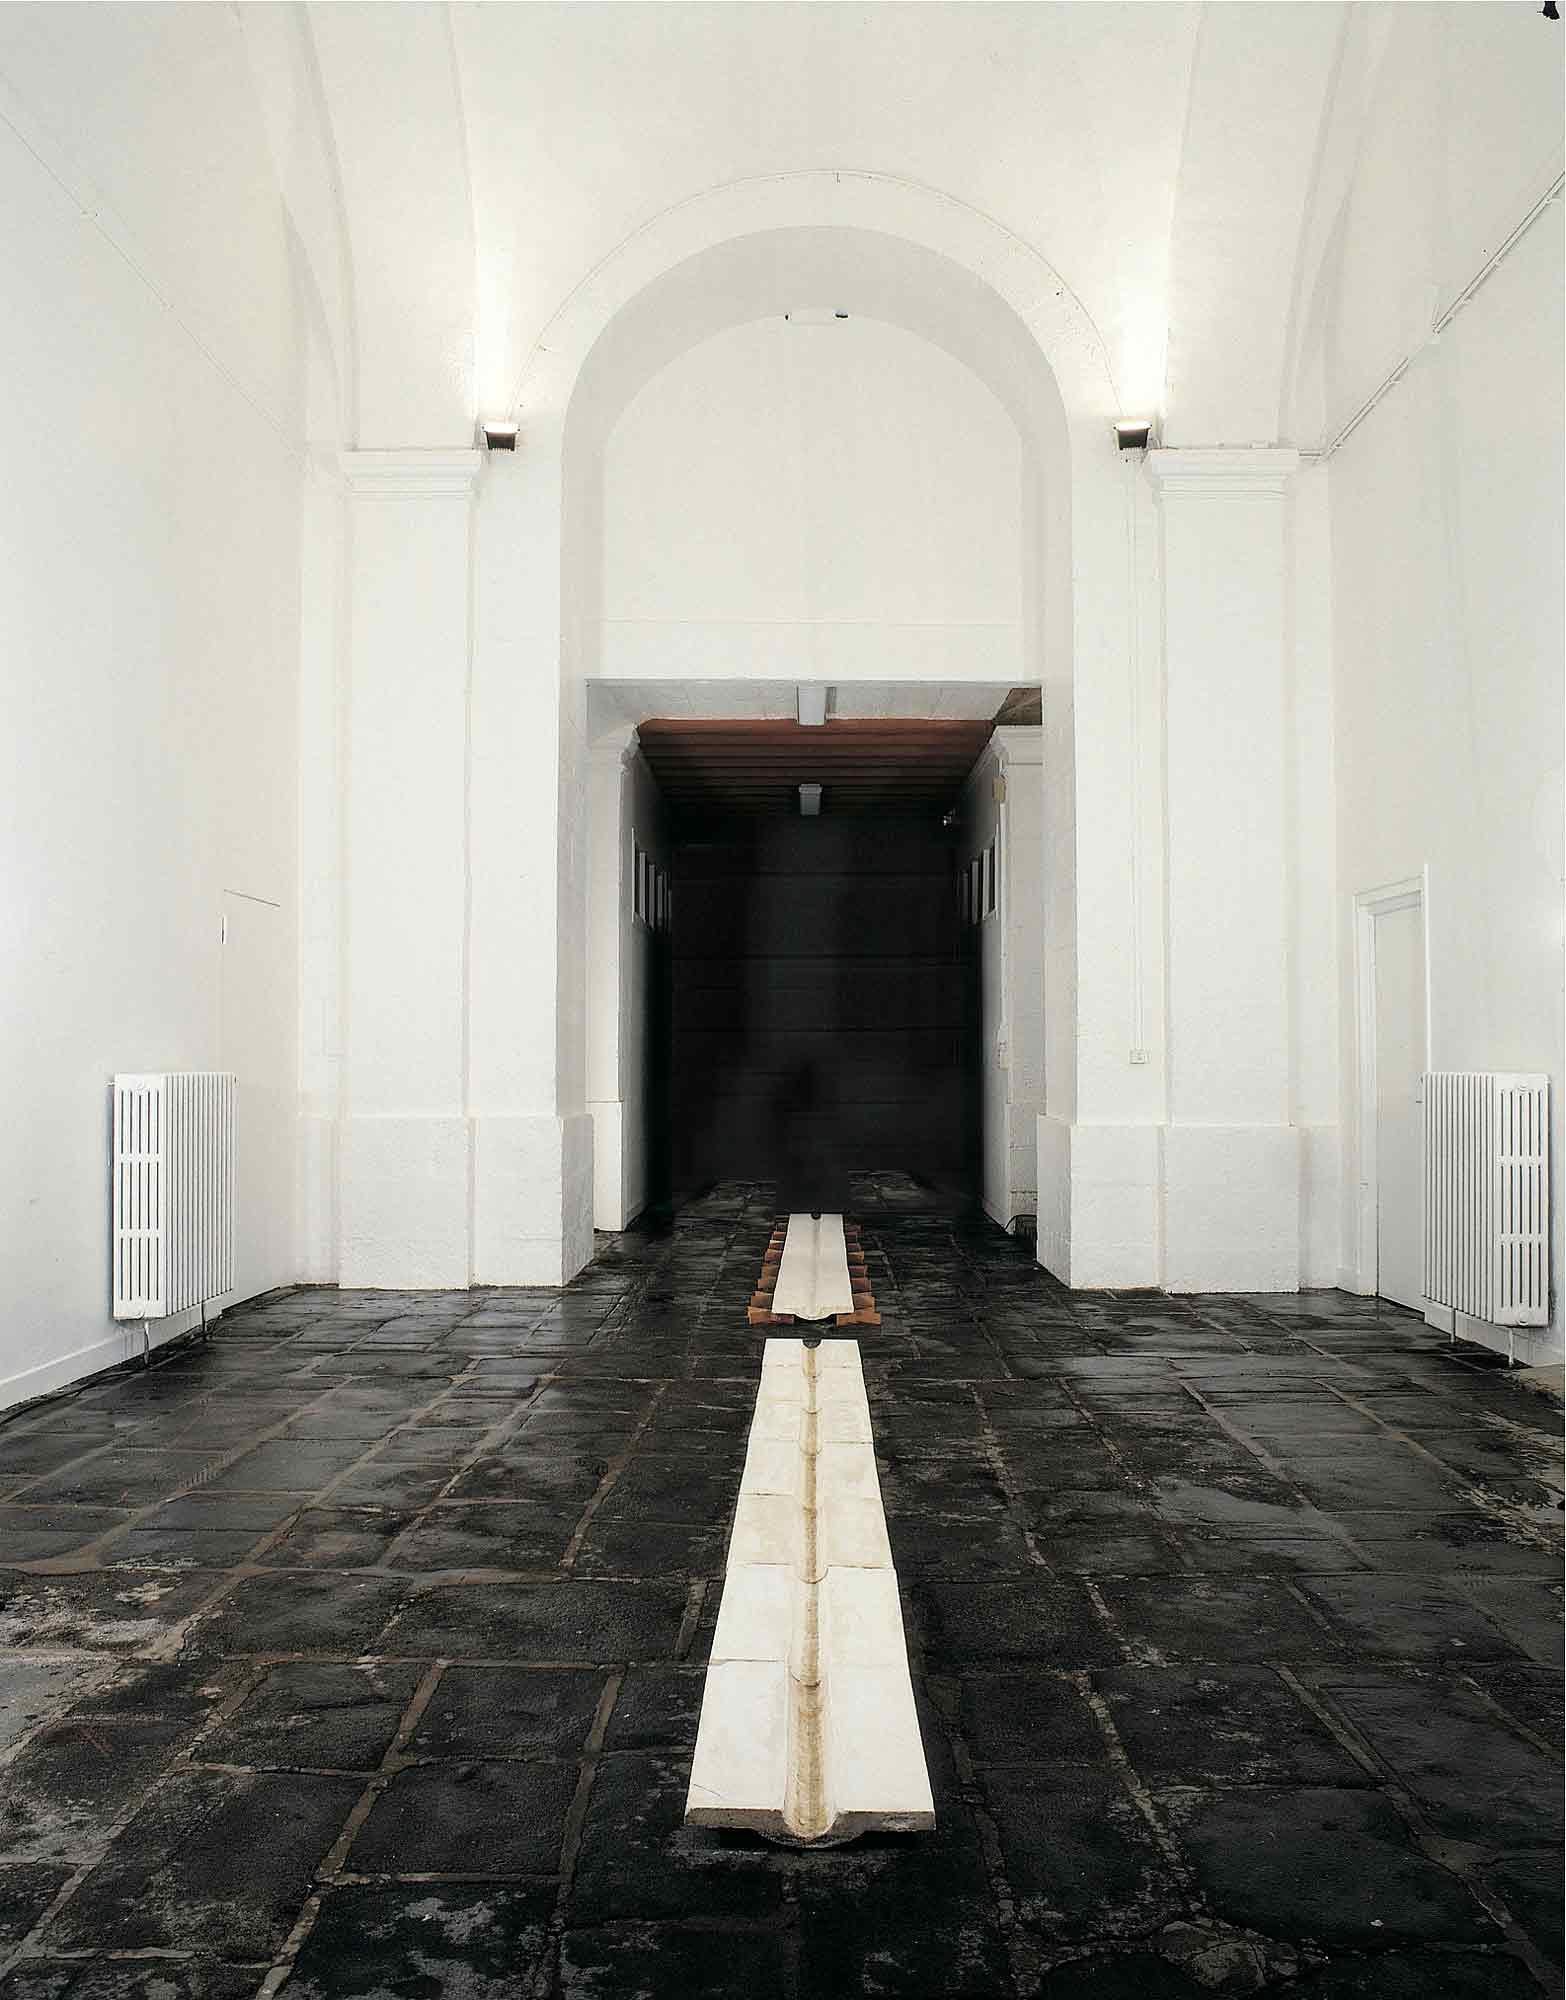 La goulotte - 1992 - Bois, tarlatane. 400 x 40 x 15 cm. Denis Falgoux